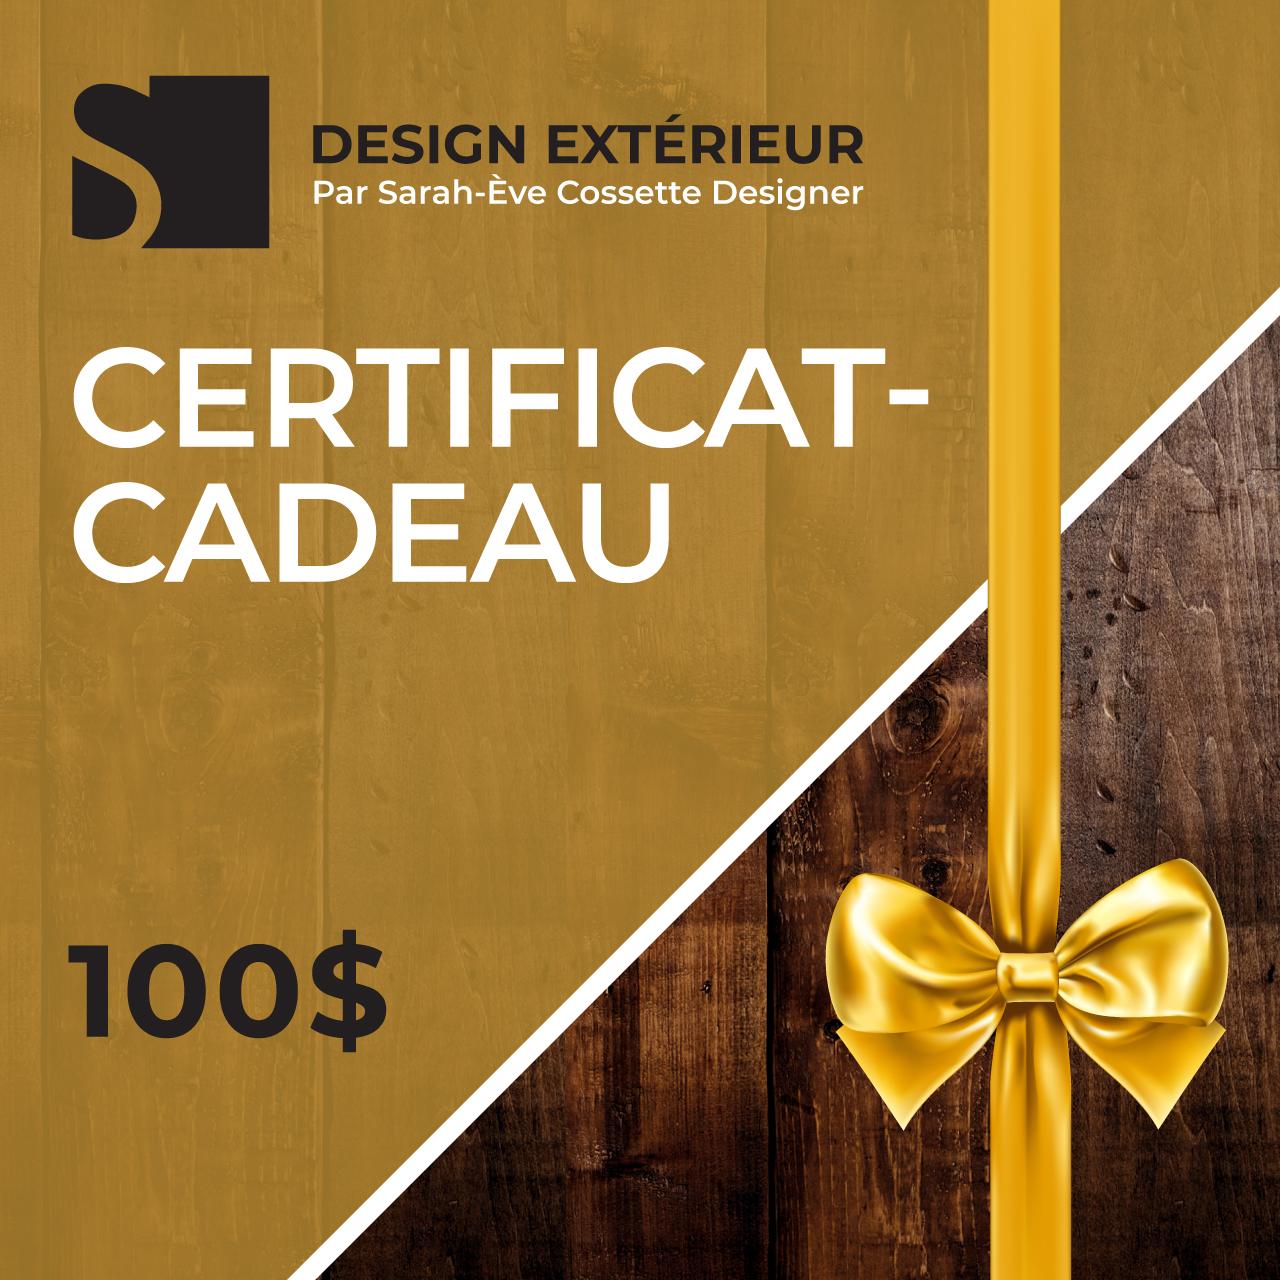 Sarah Eve Cossette Certificat Cadeau Virtuel 100 dollars Design Exterieur